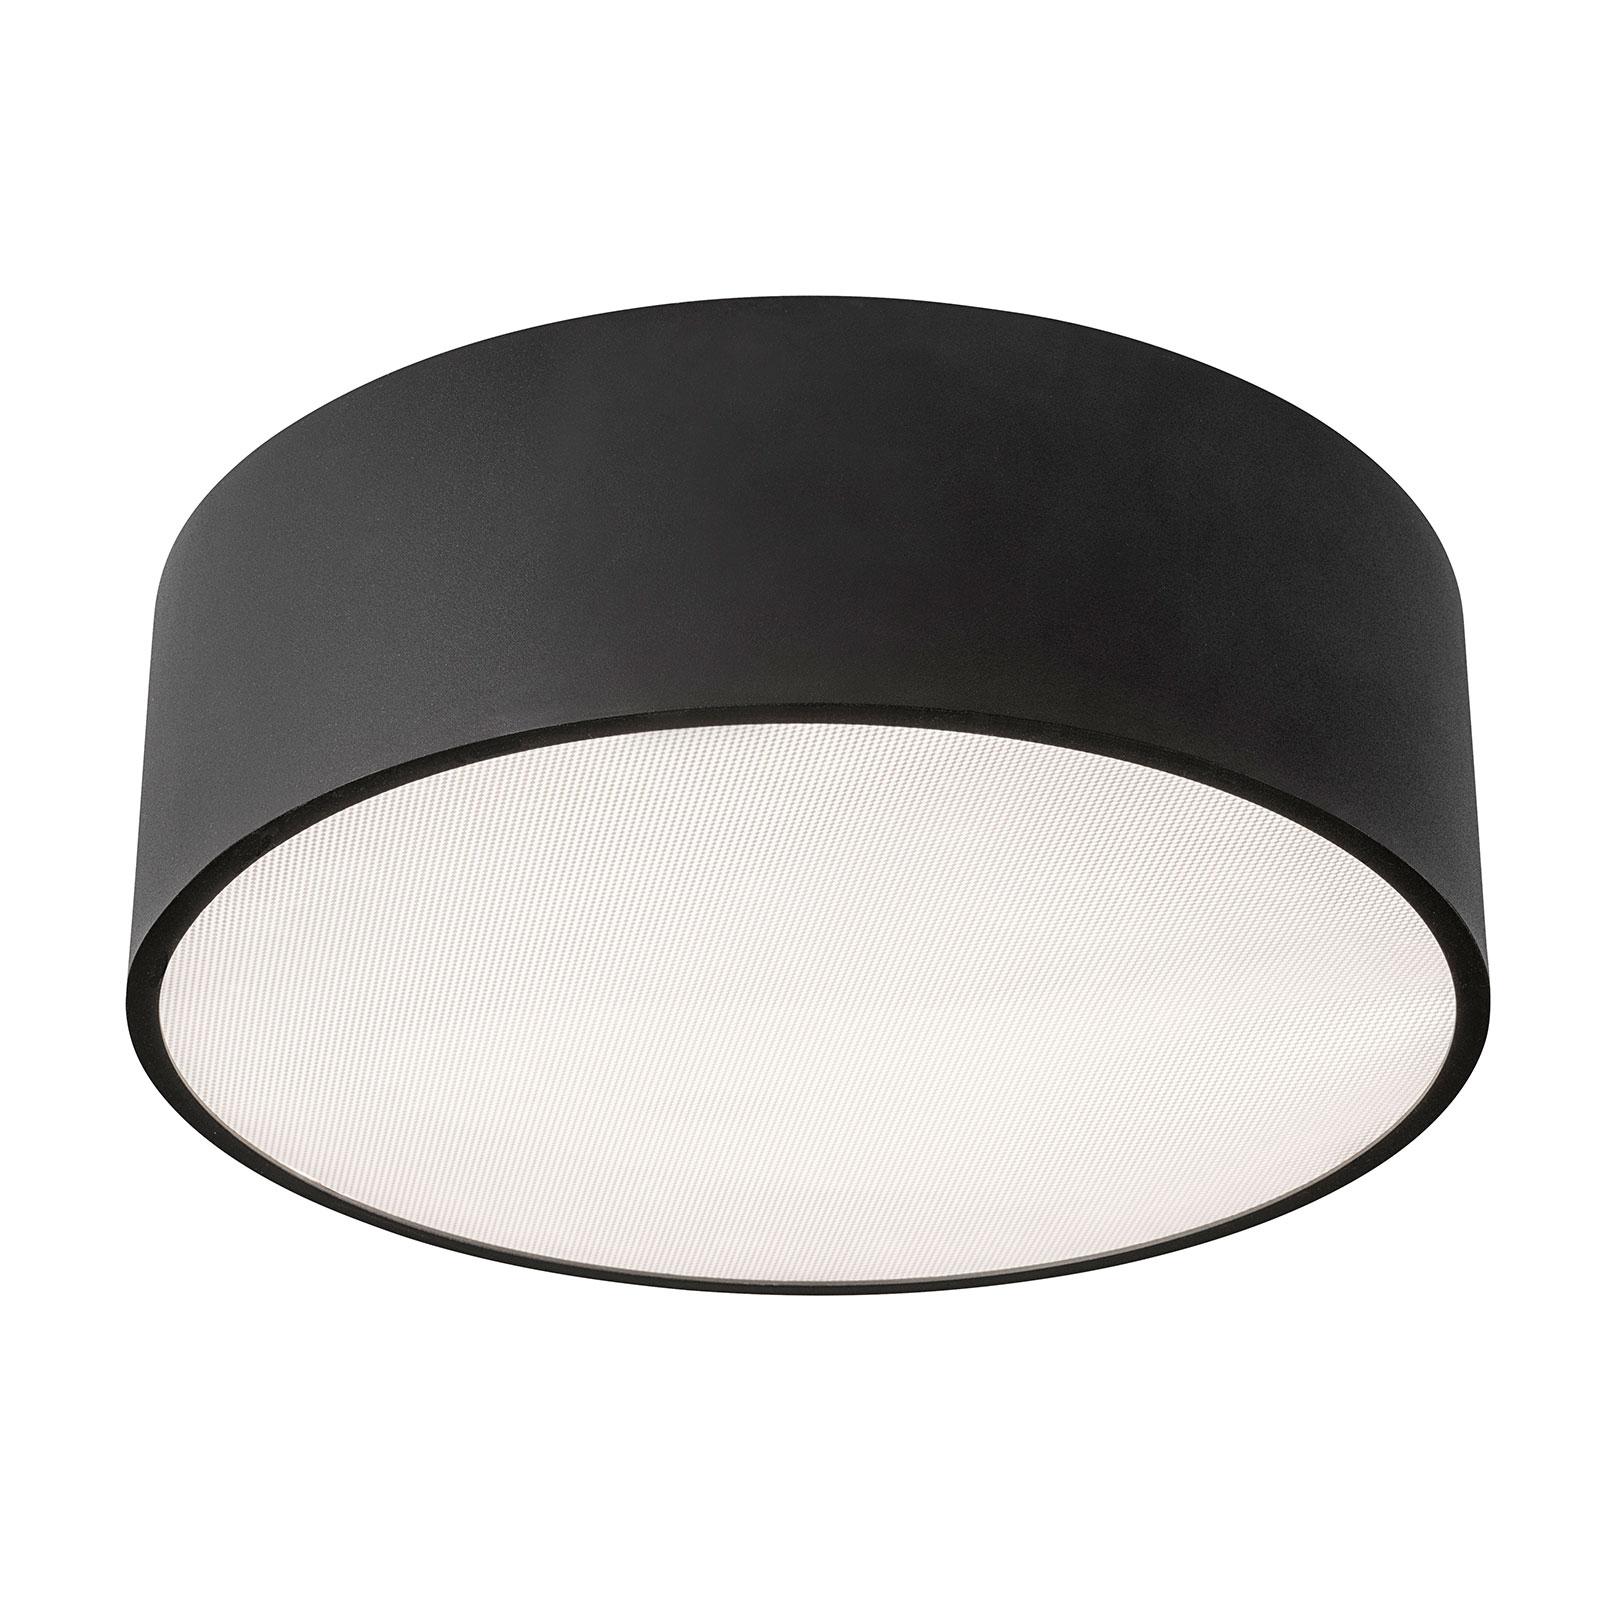 LEDS-C4 Luno LED plafondlamp